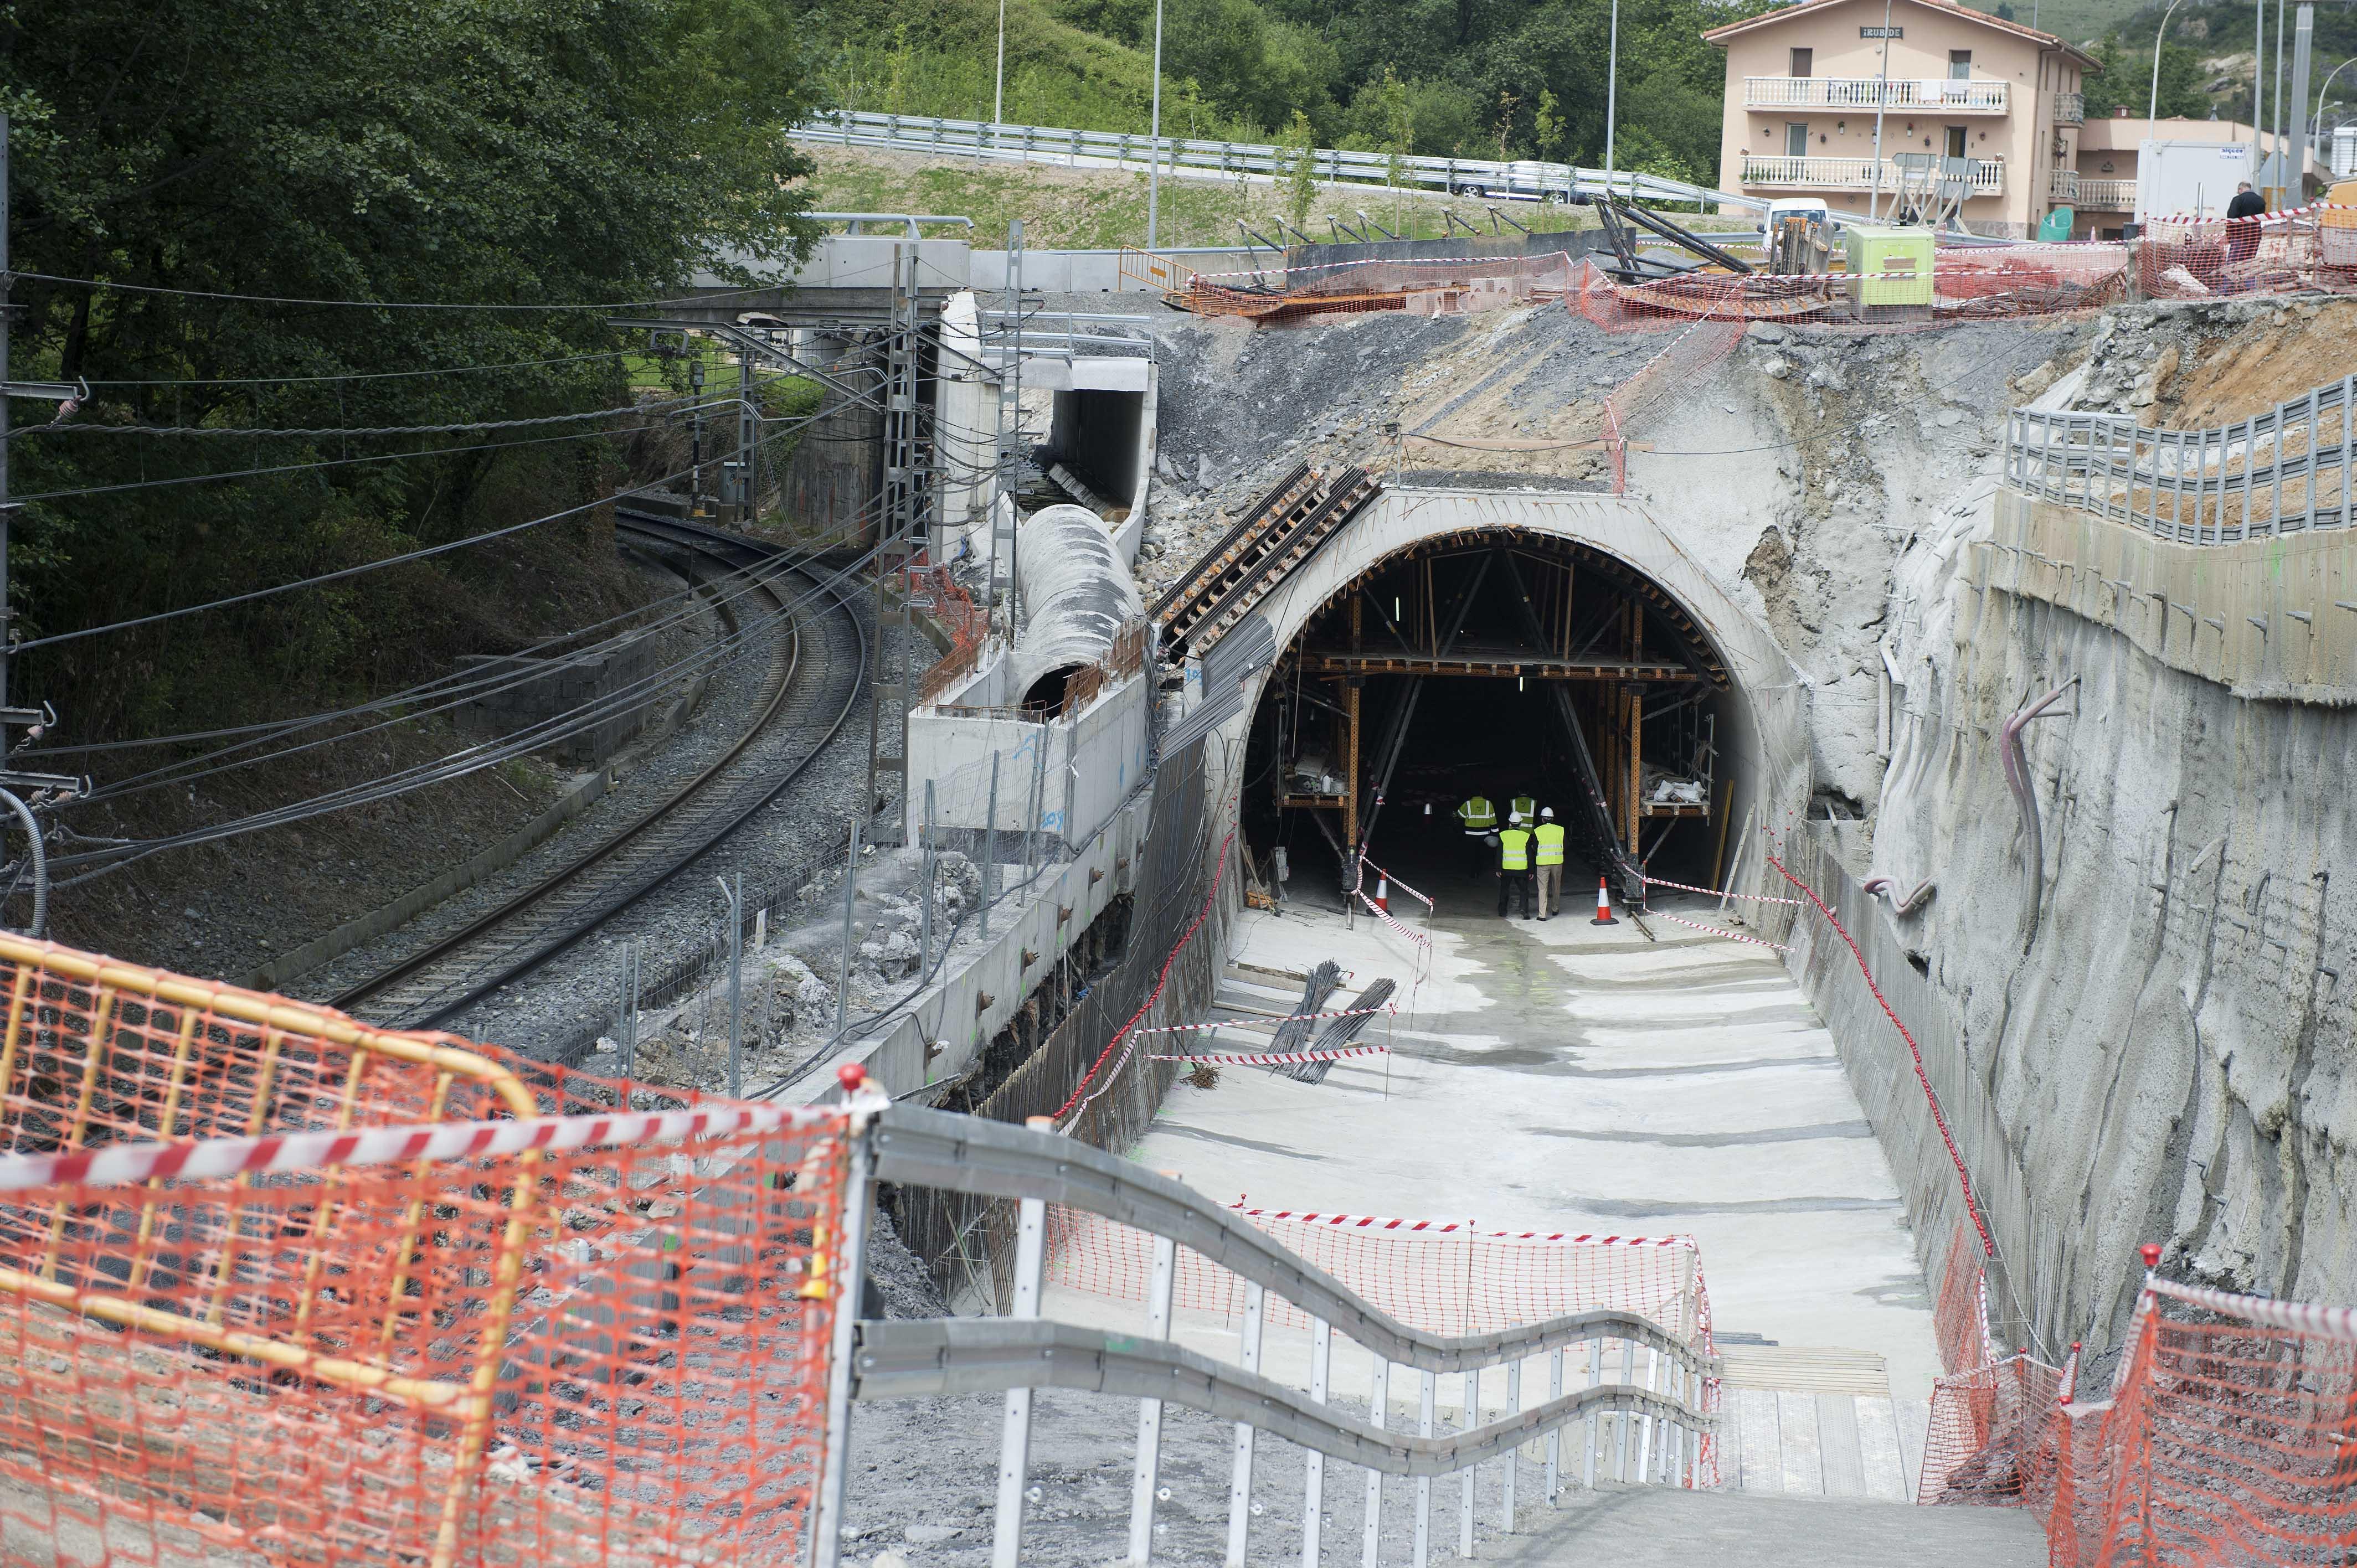 2011_06_03_cale_metro_vias_tunel.jpg